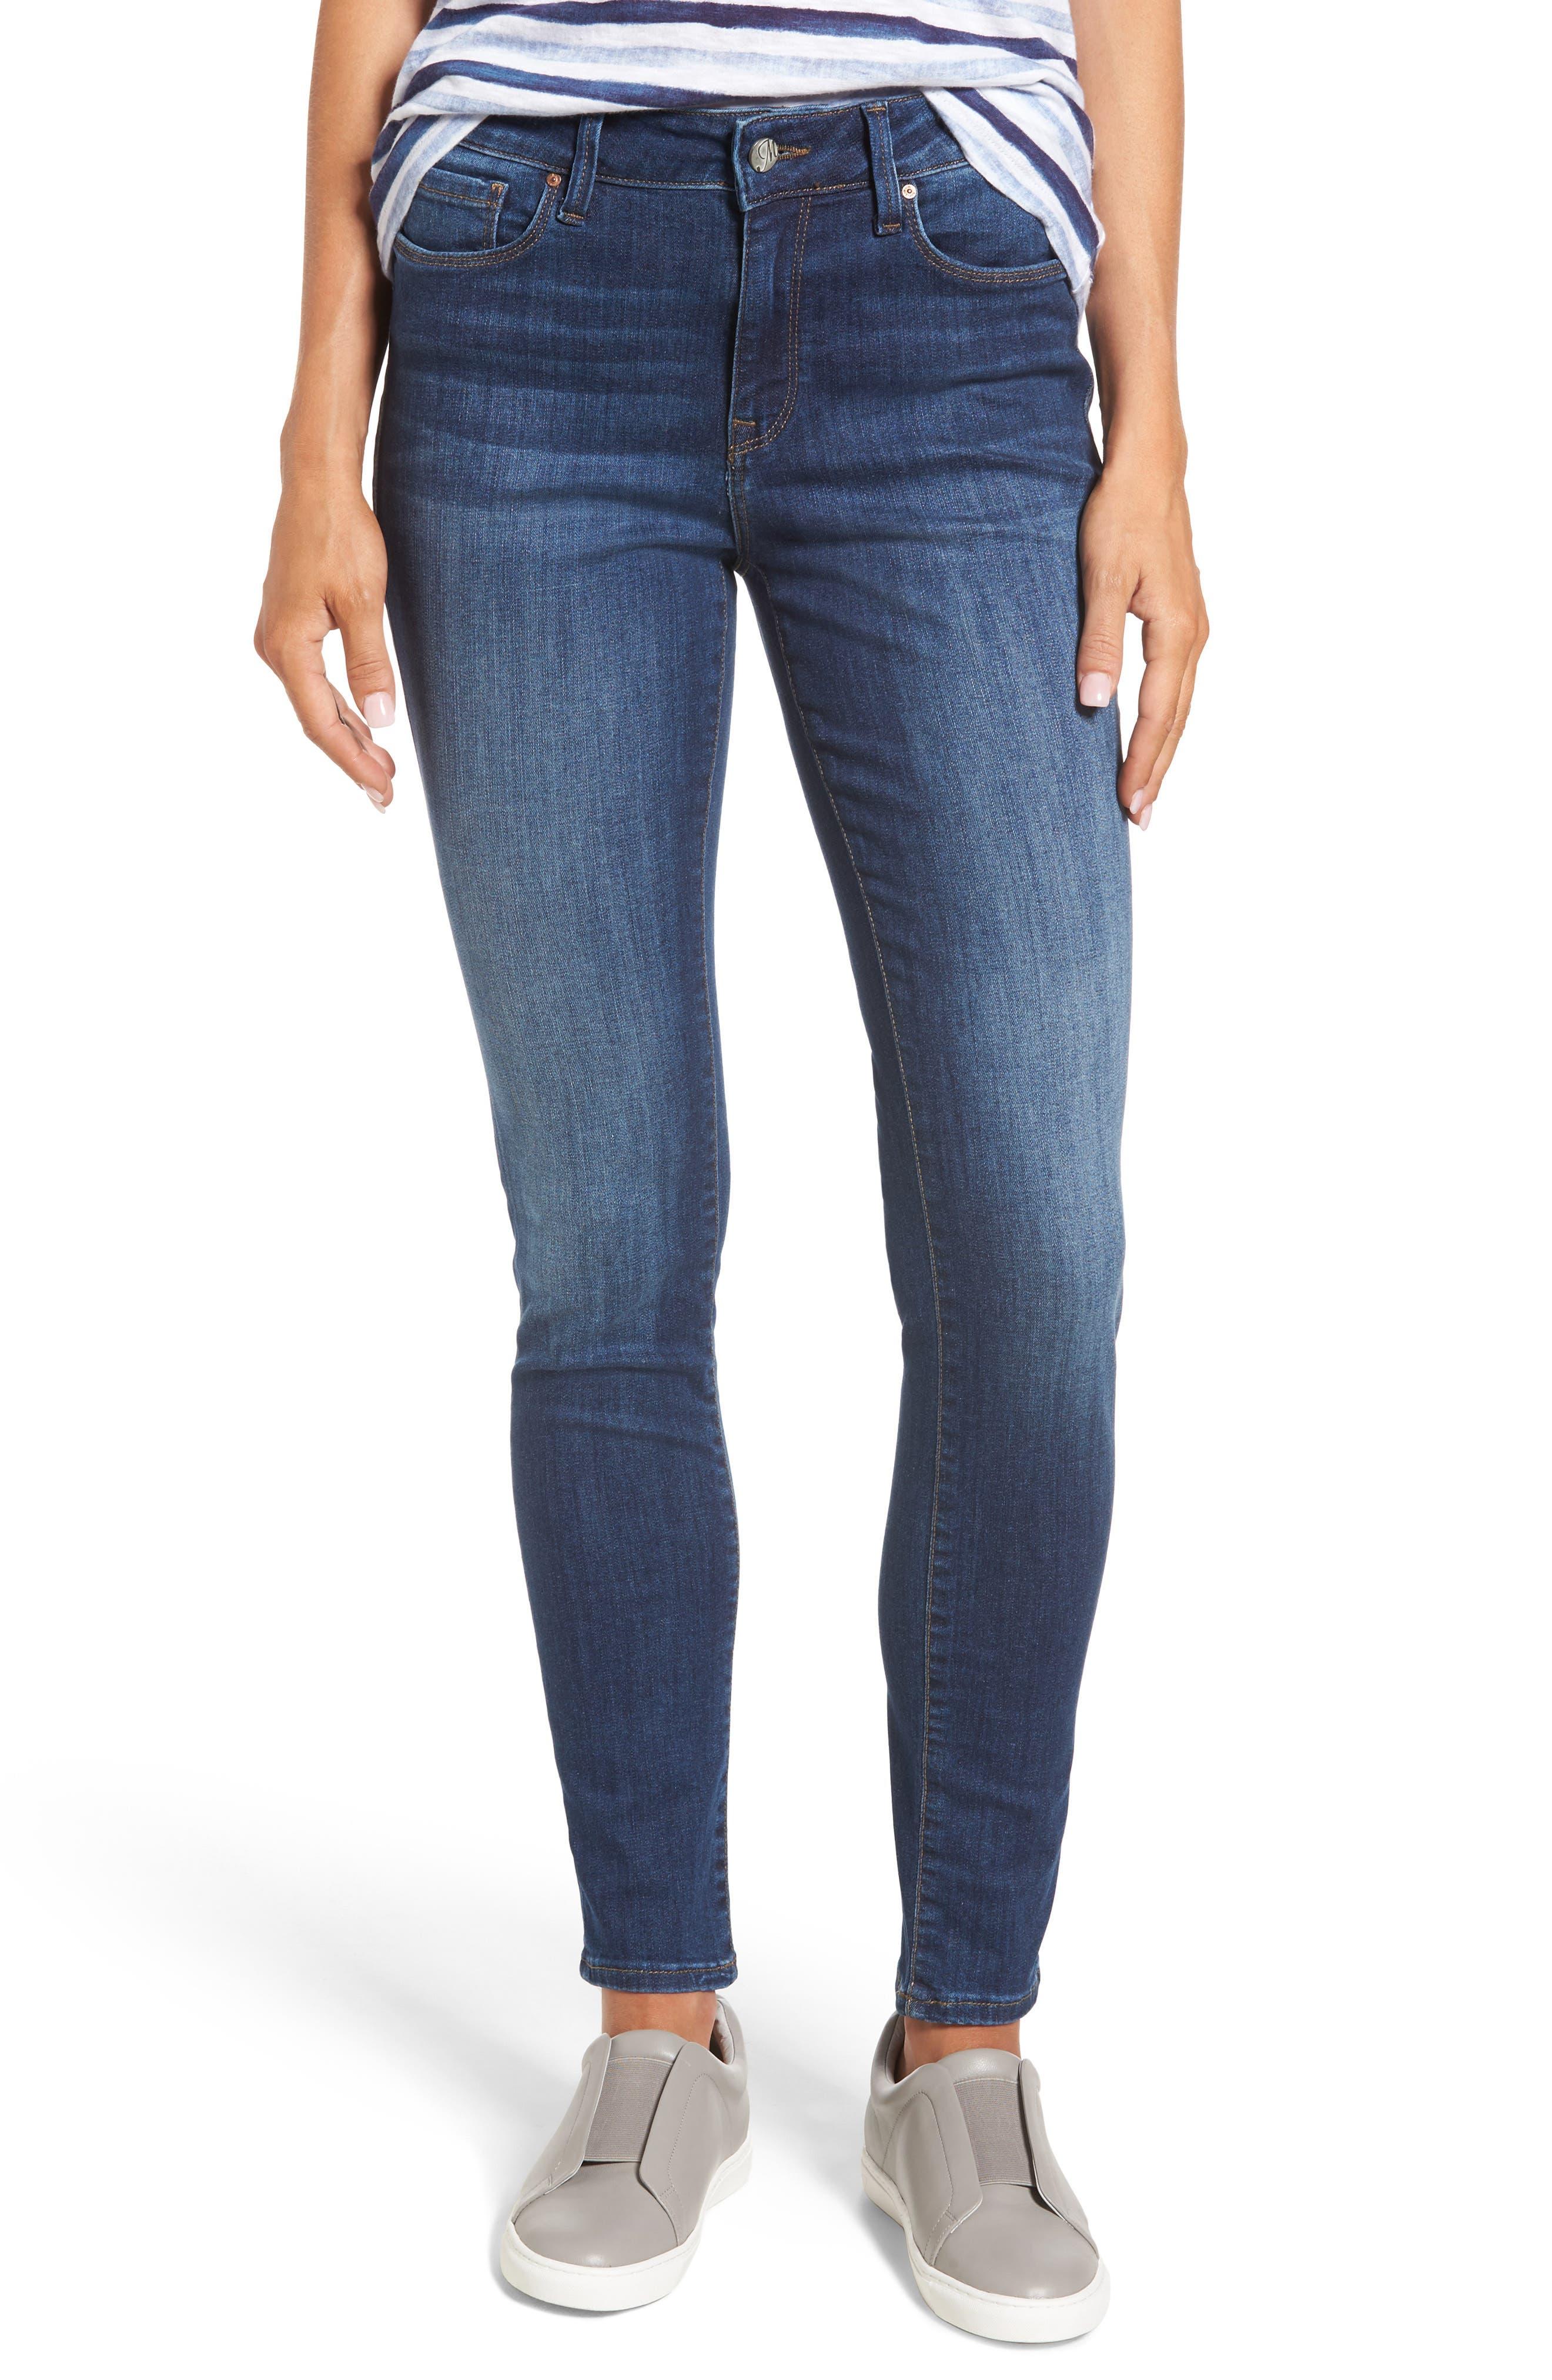 Alissa Super Skinny Jeans,                         Main,                         color, Dark Indigo Tribeca